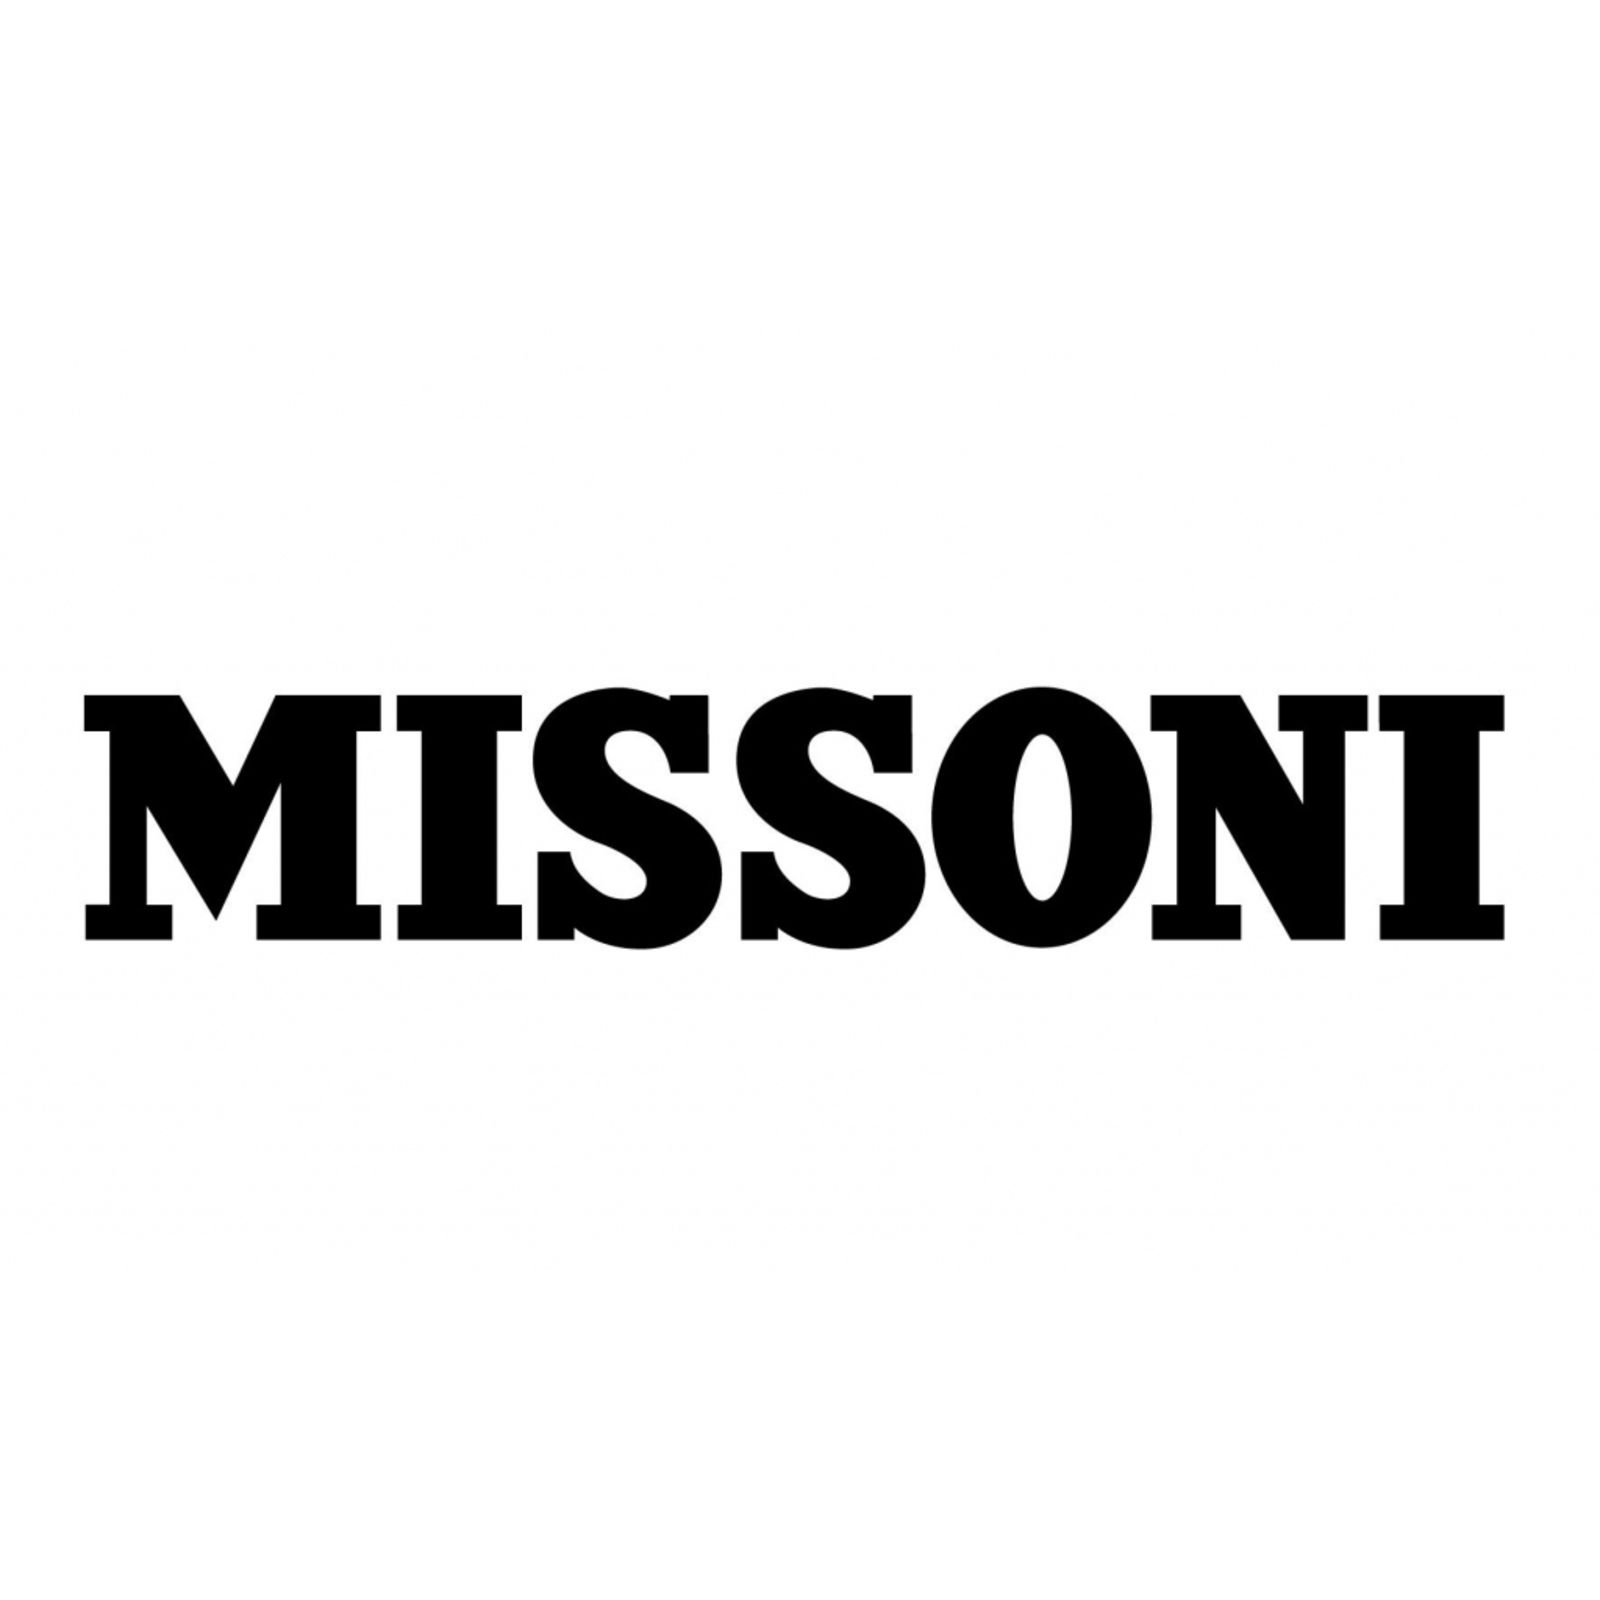 MISSONI (Image 1)